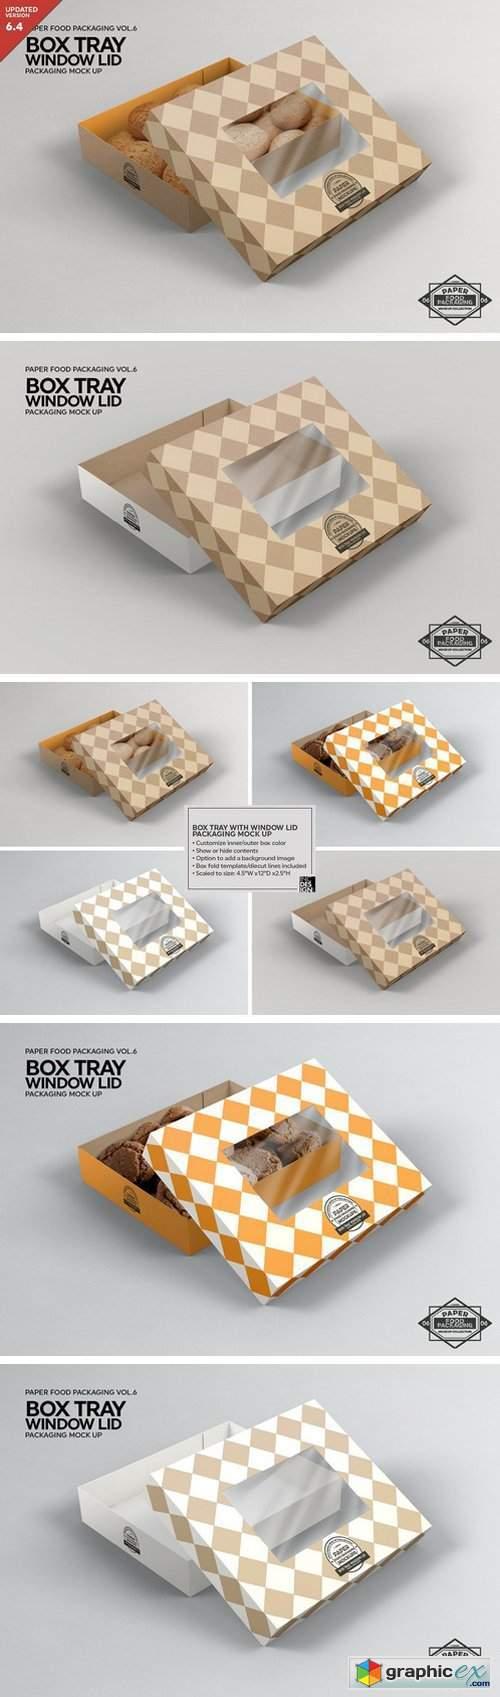 Box Tray Window Lid Packaging Mockup